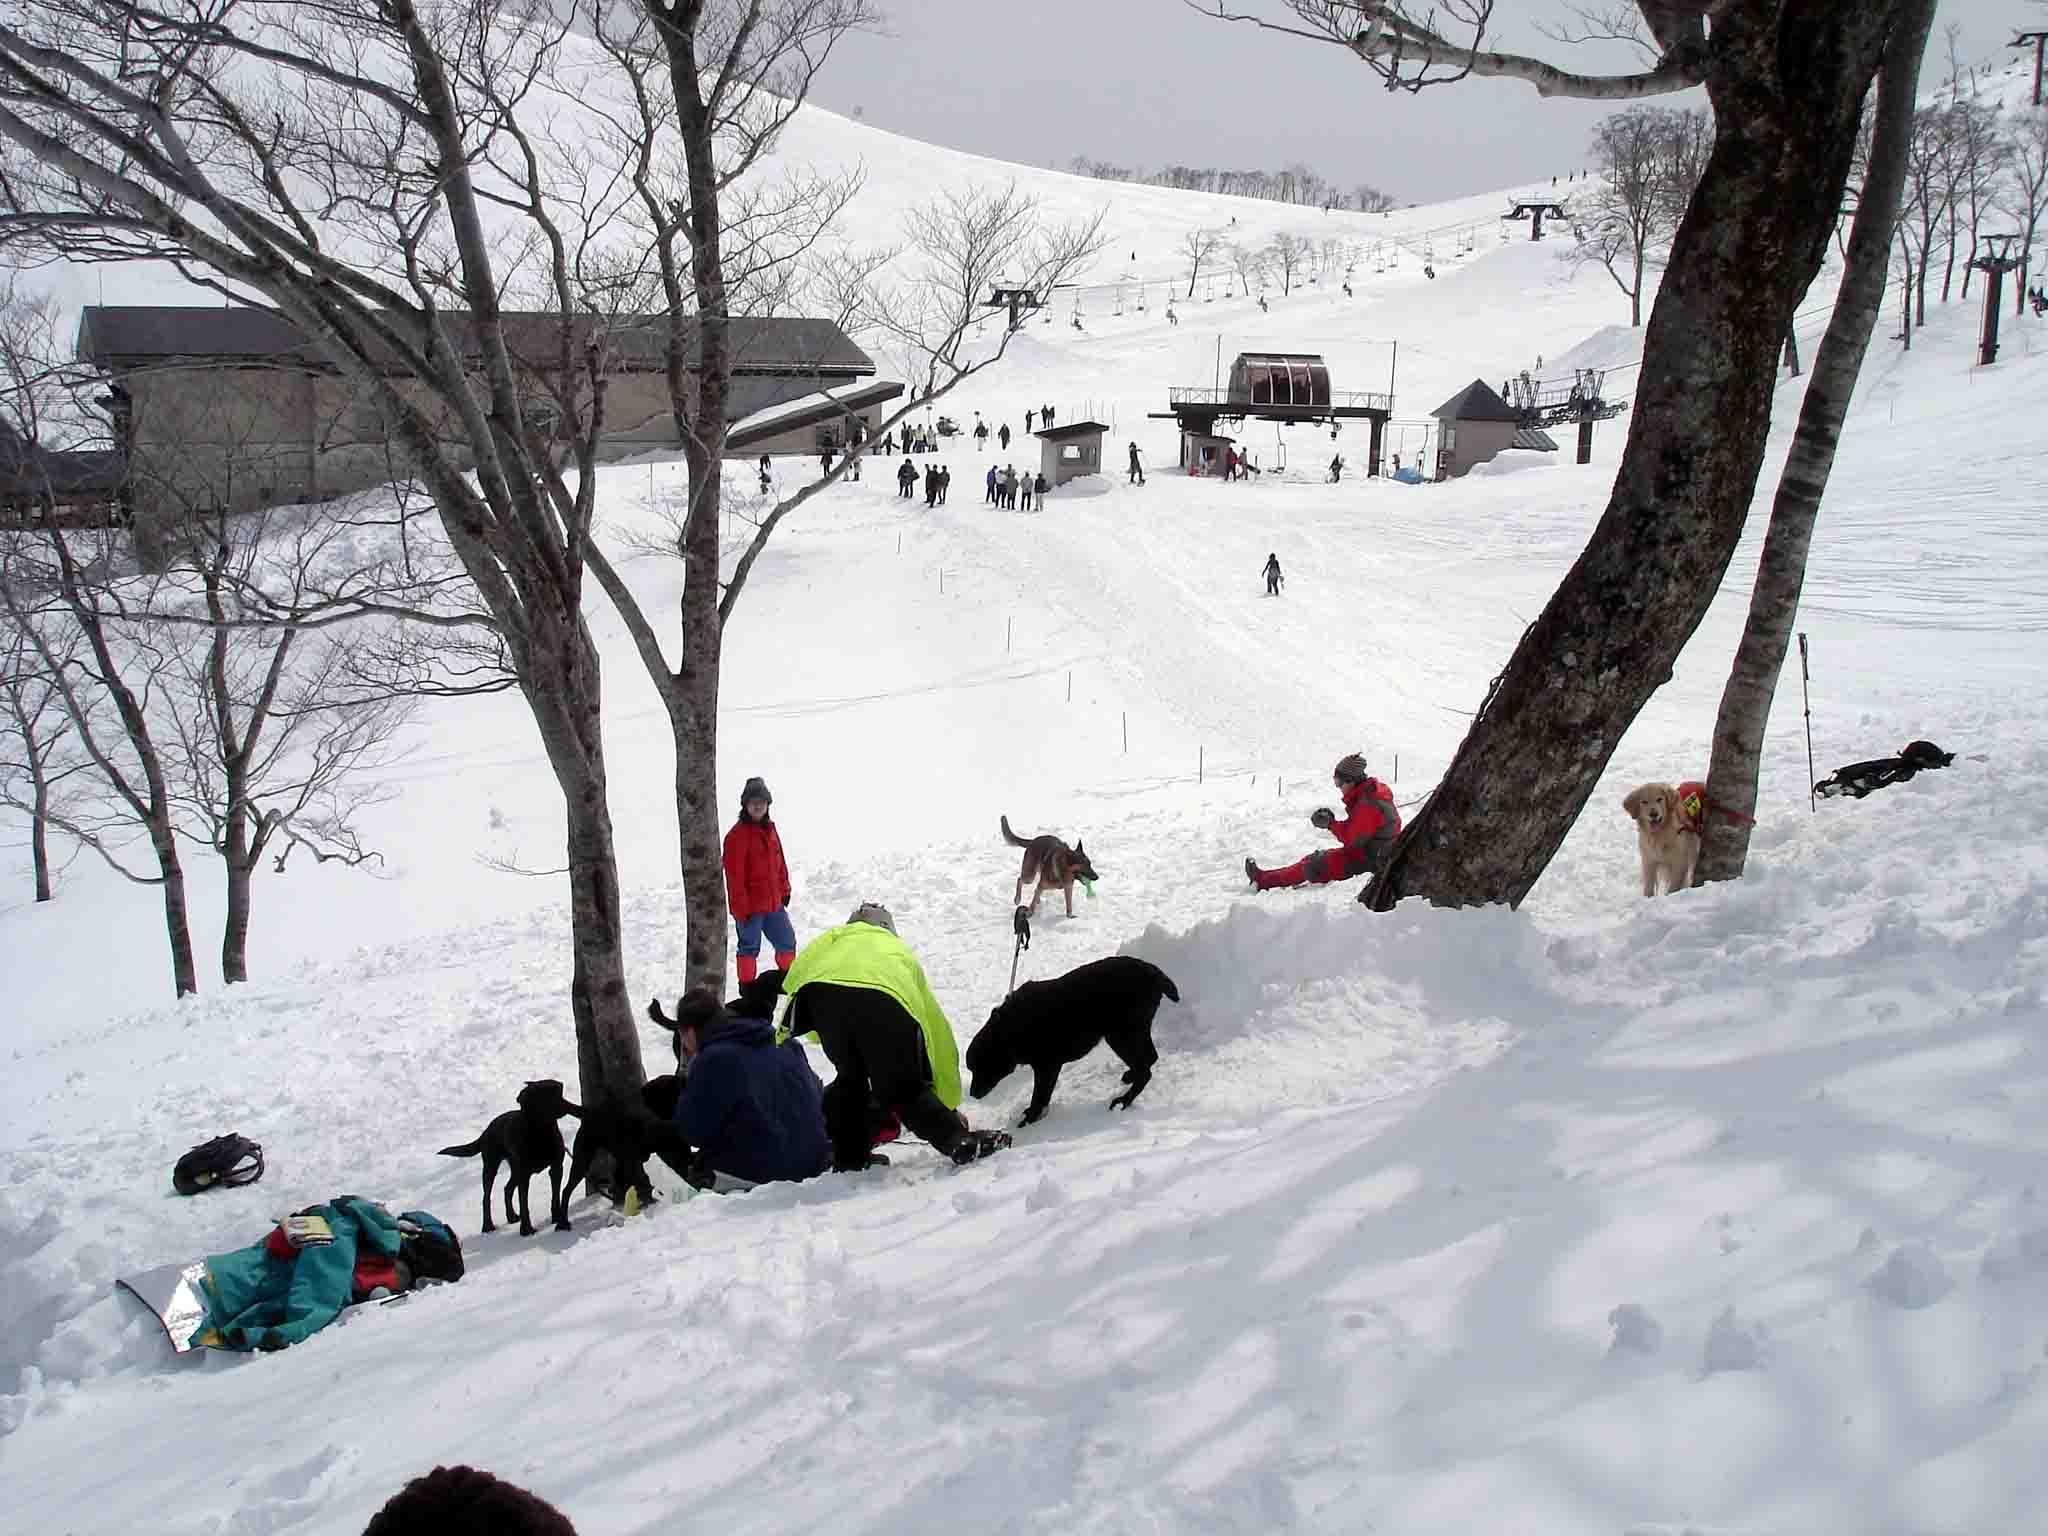 Dsc00187 スキー場脇の斜面で(良い天気)